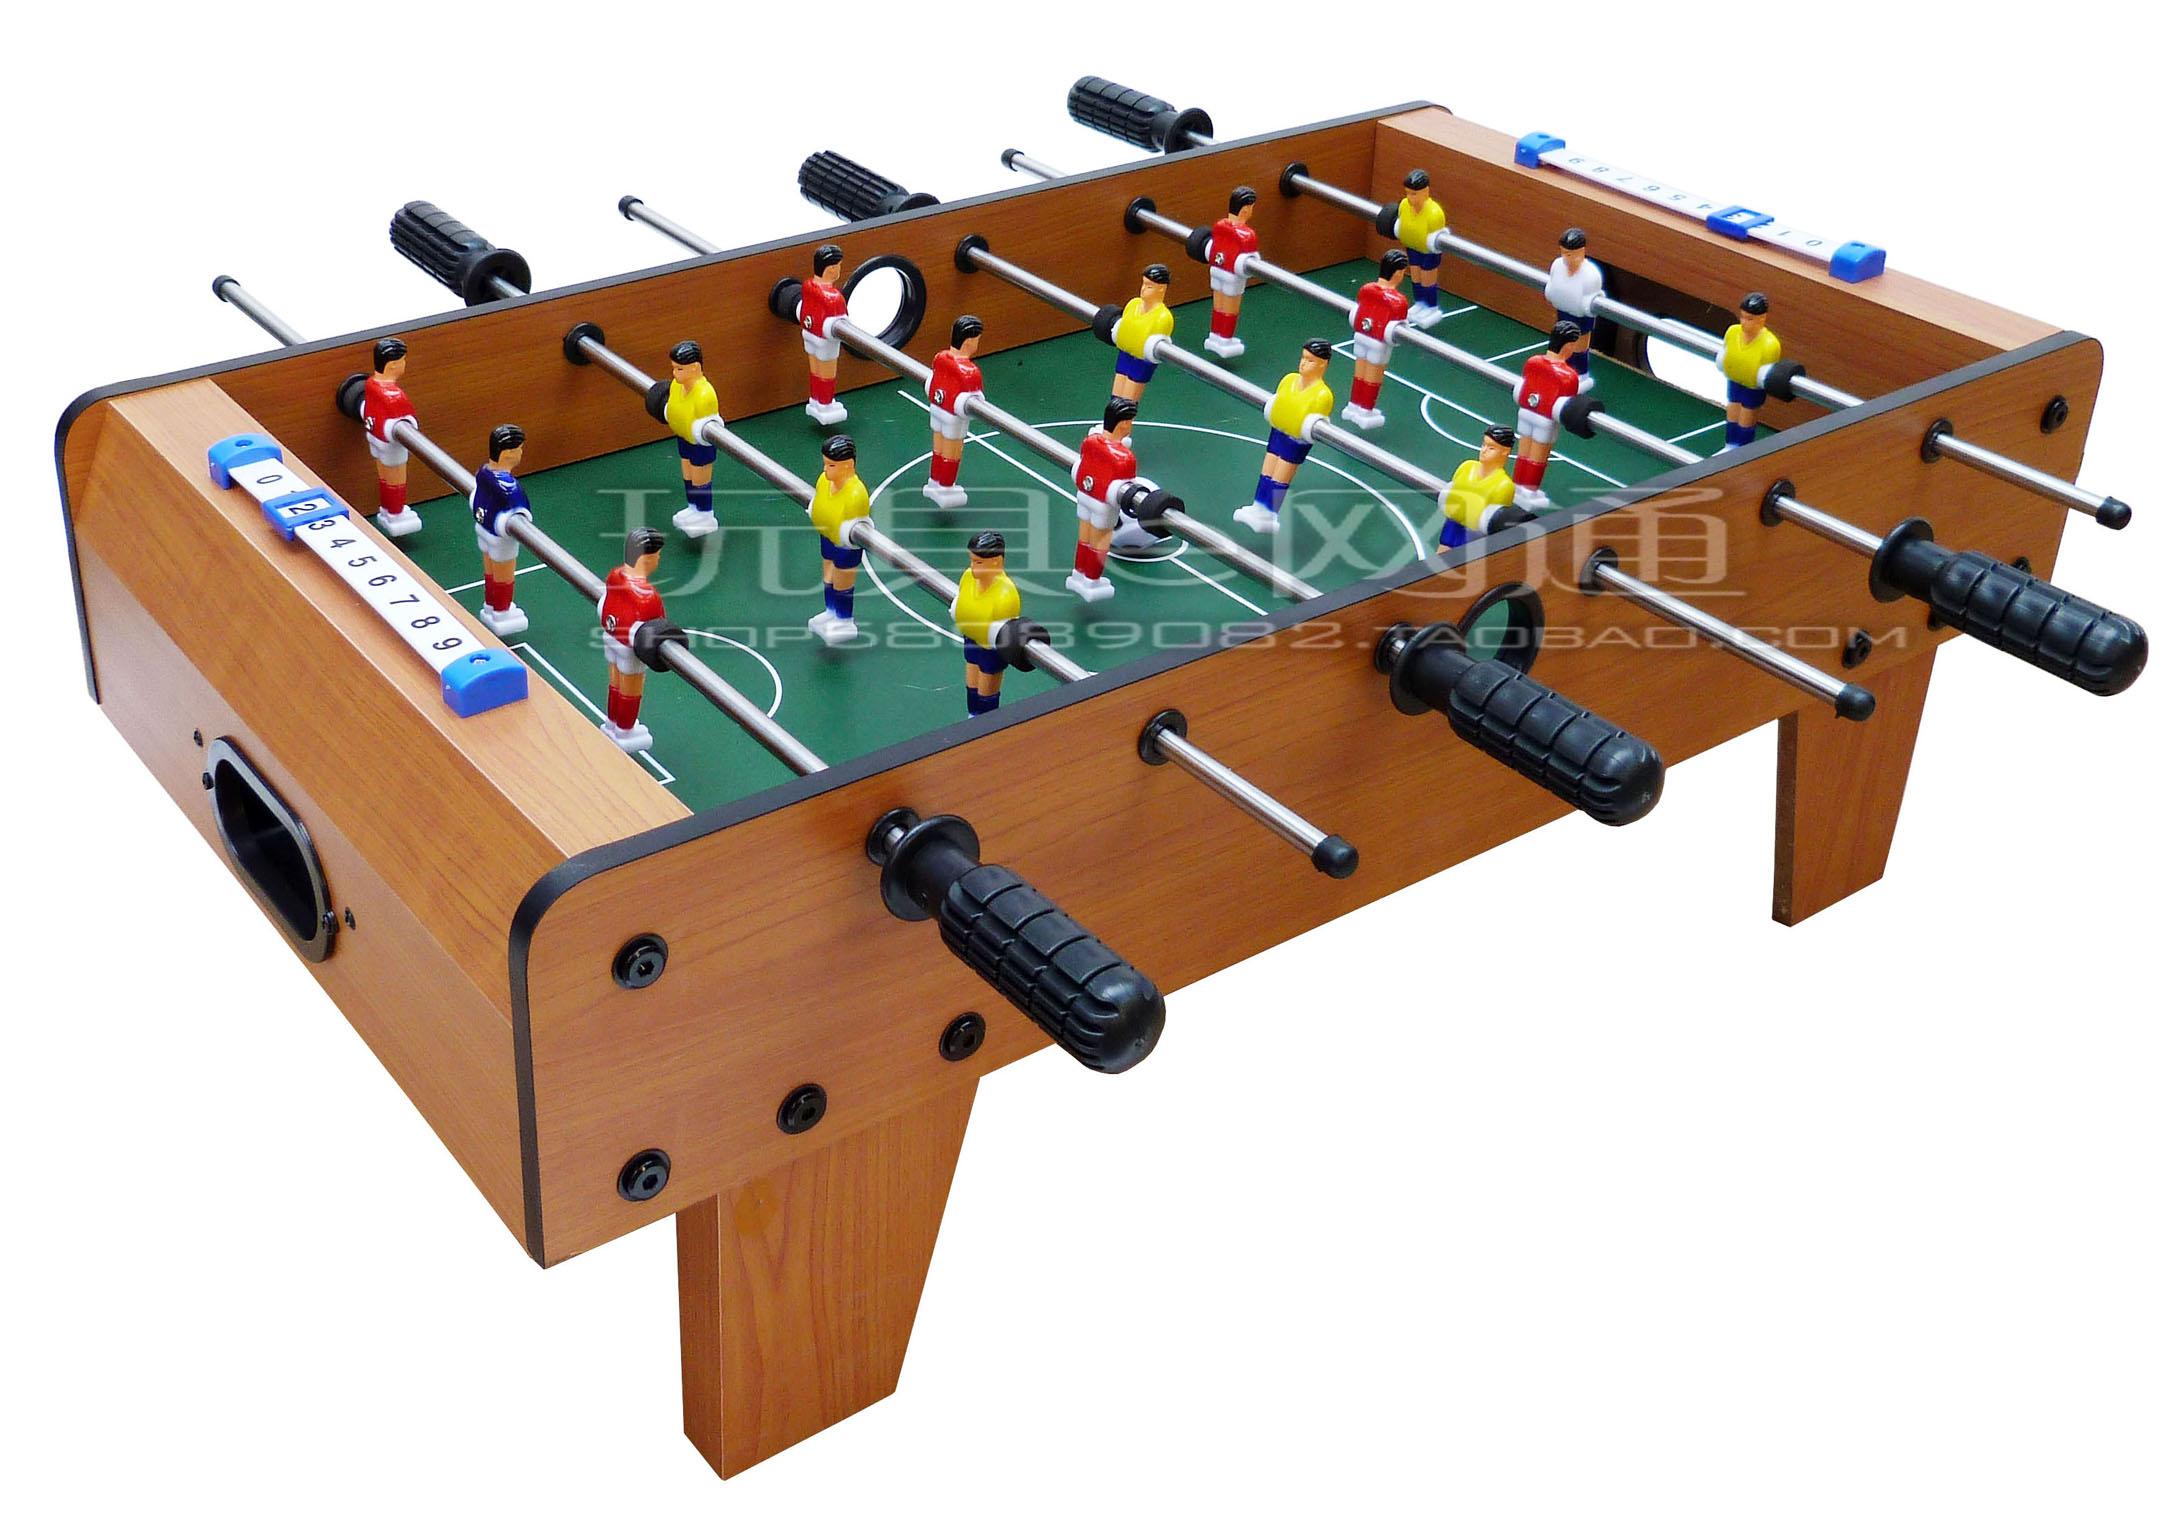 Child table football machine toy(China (Mainland))